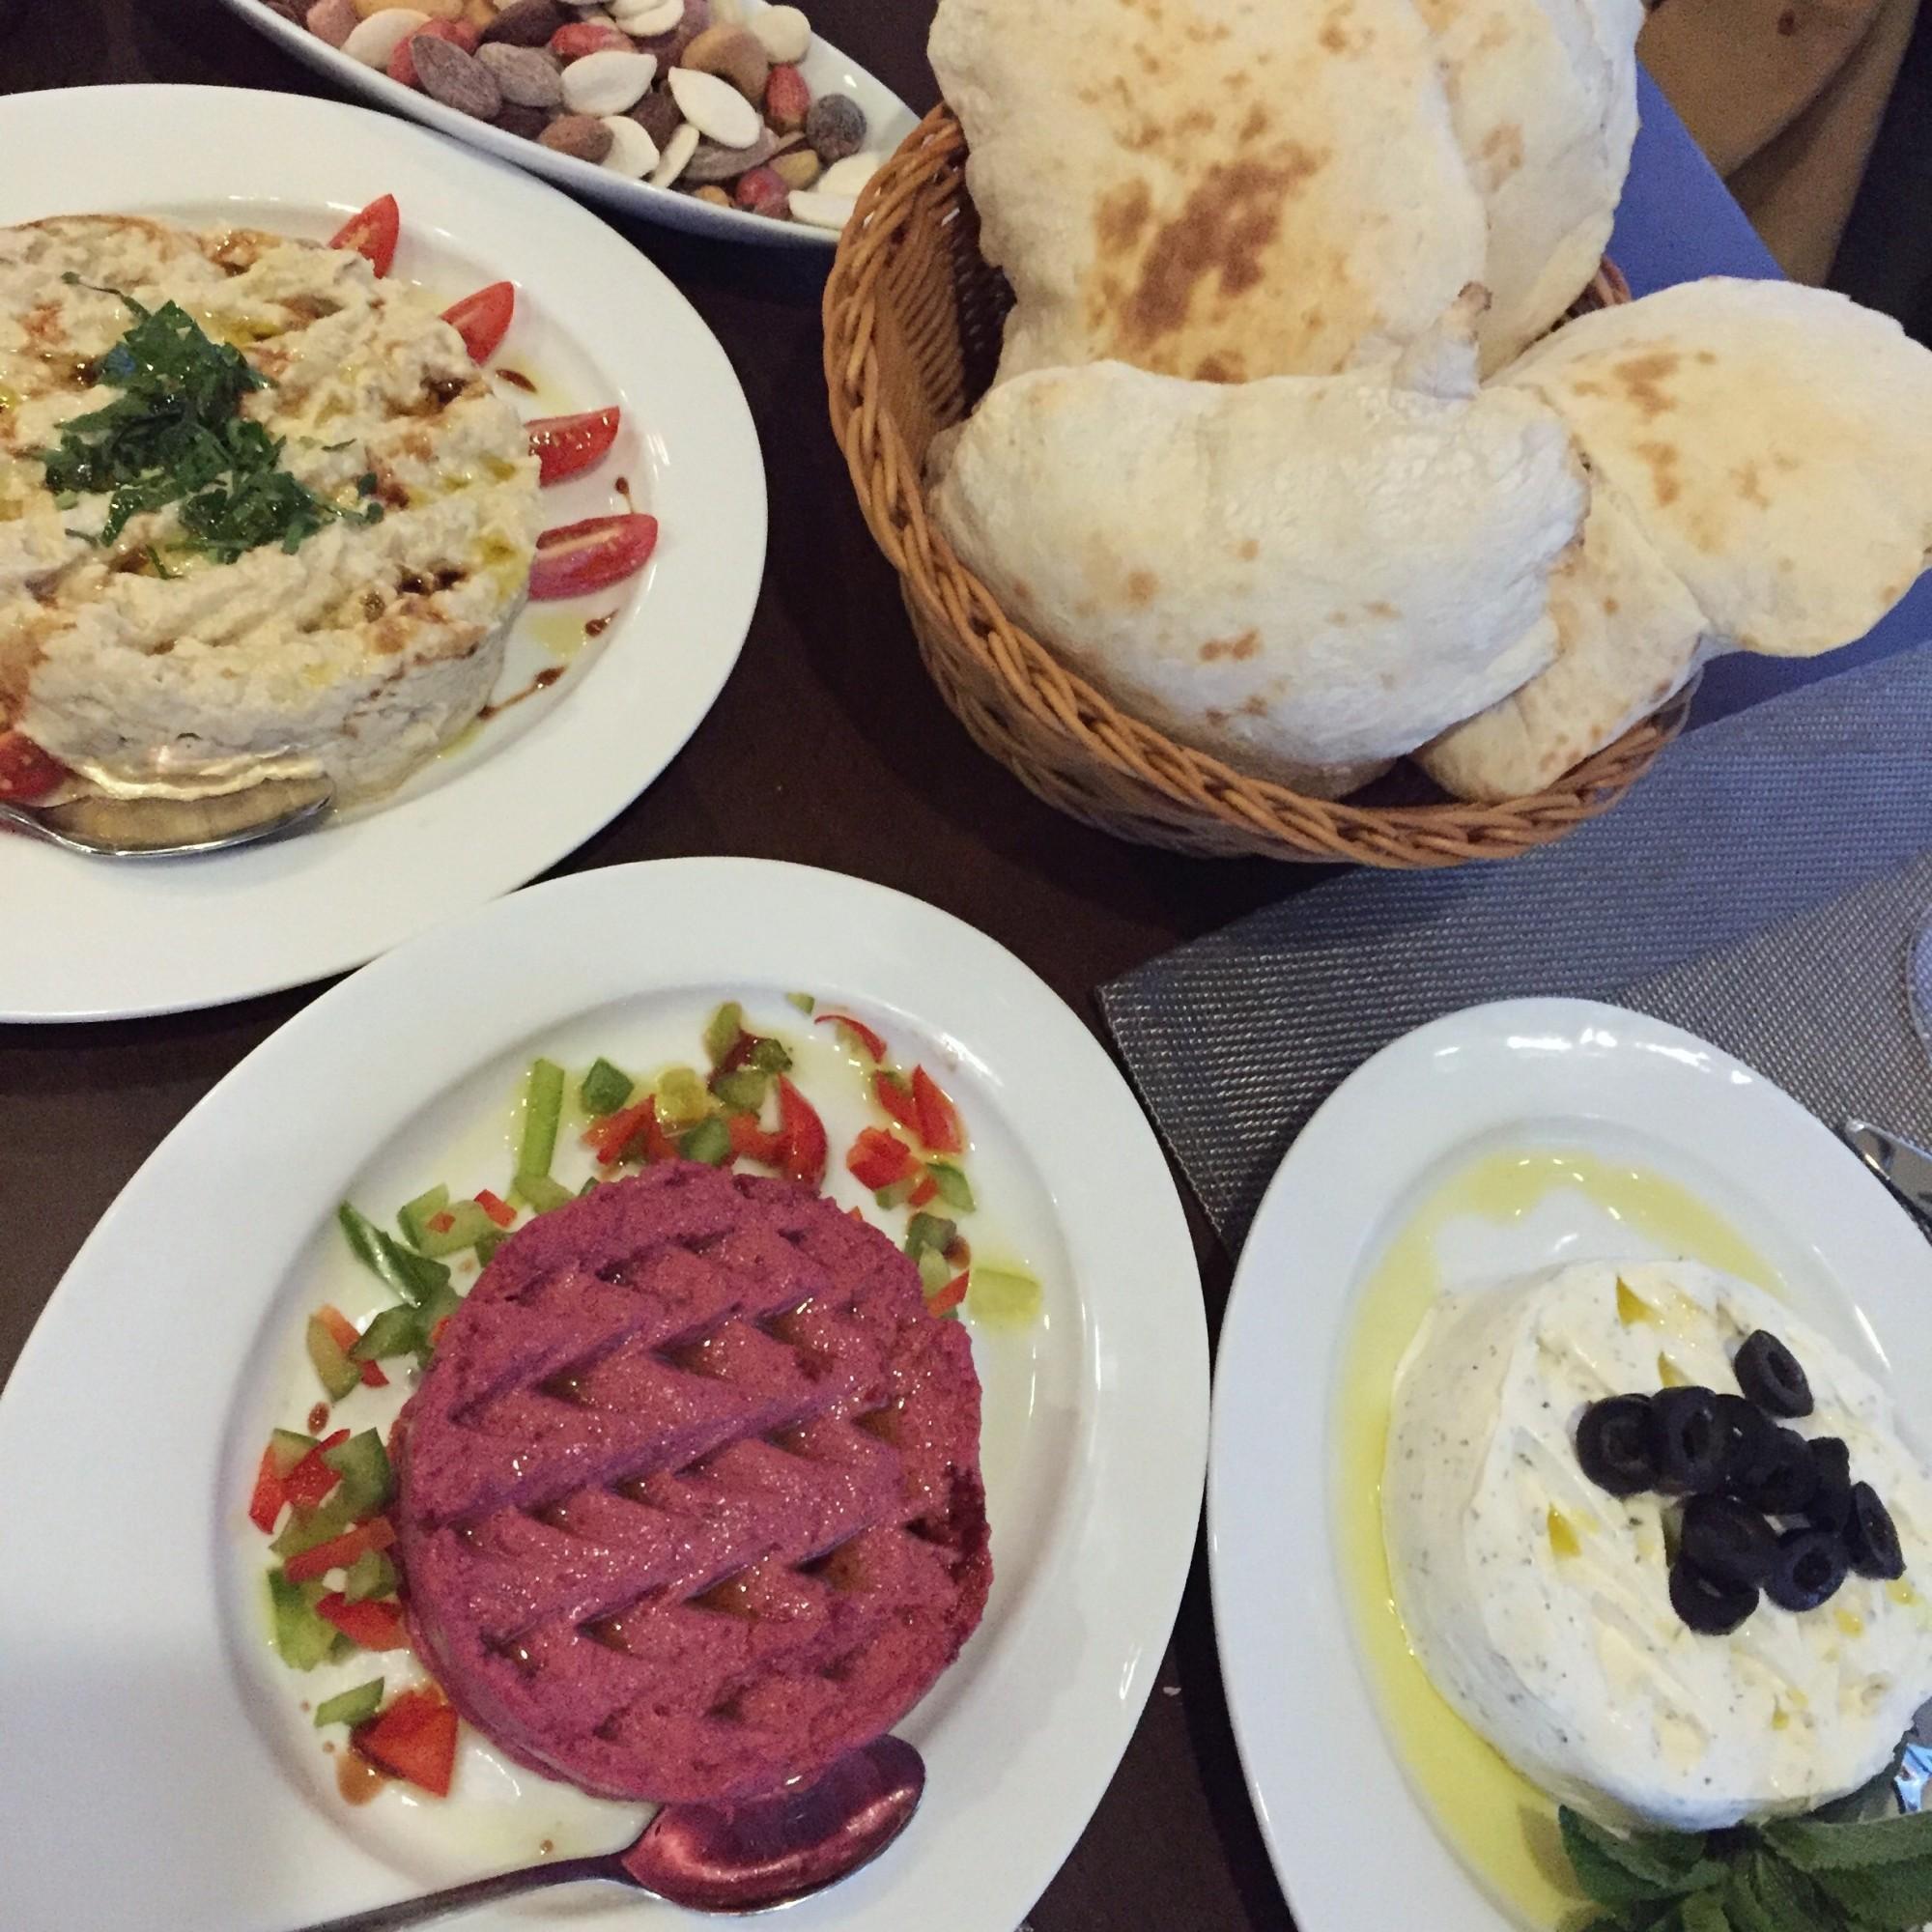 Beroya syrian restaurant laval 5